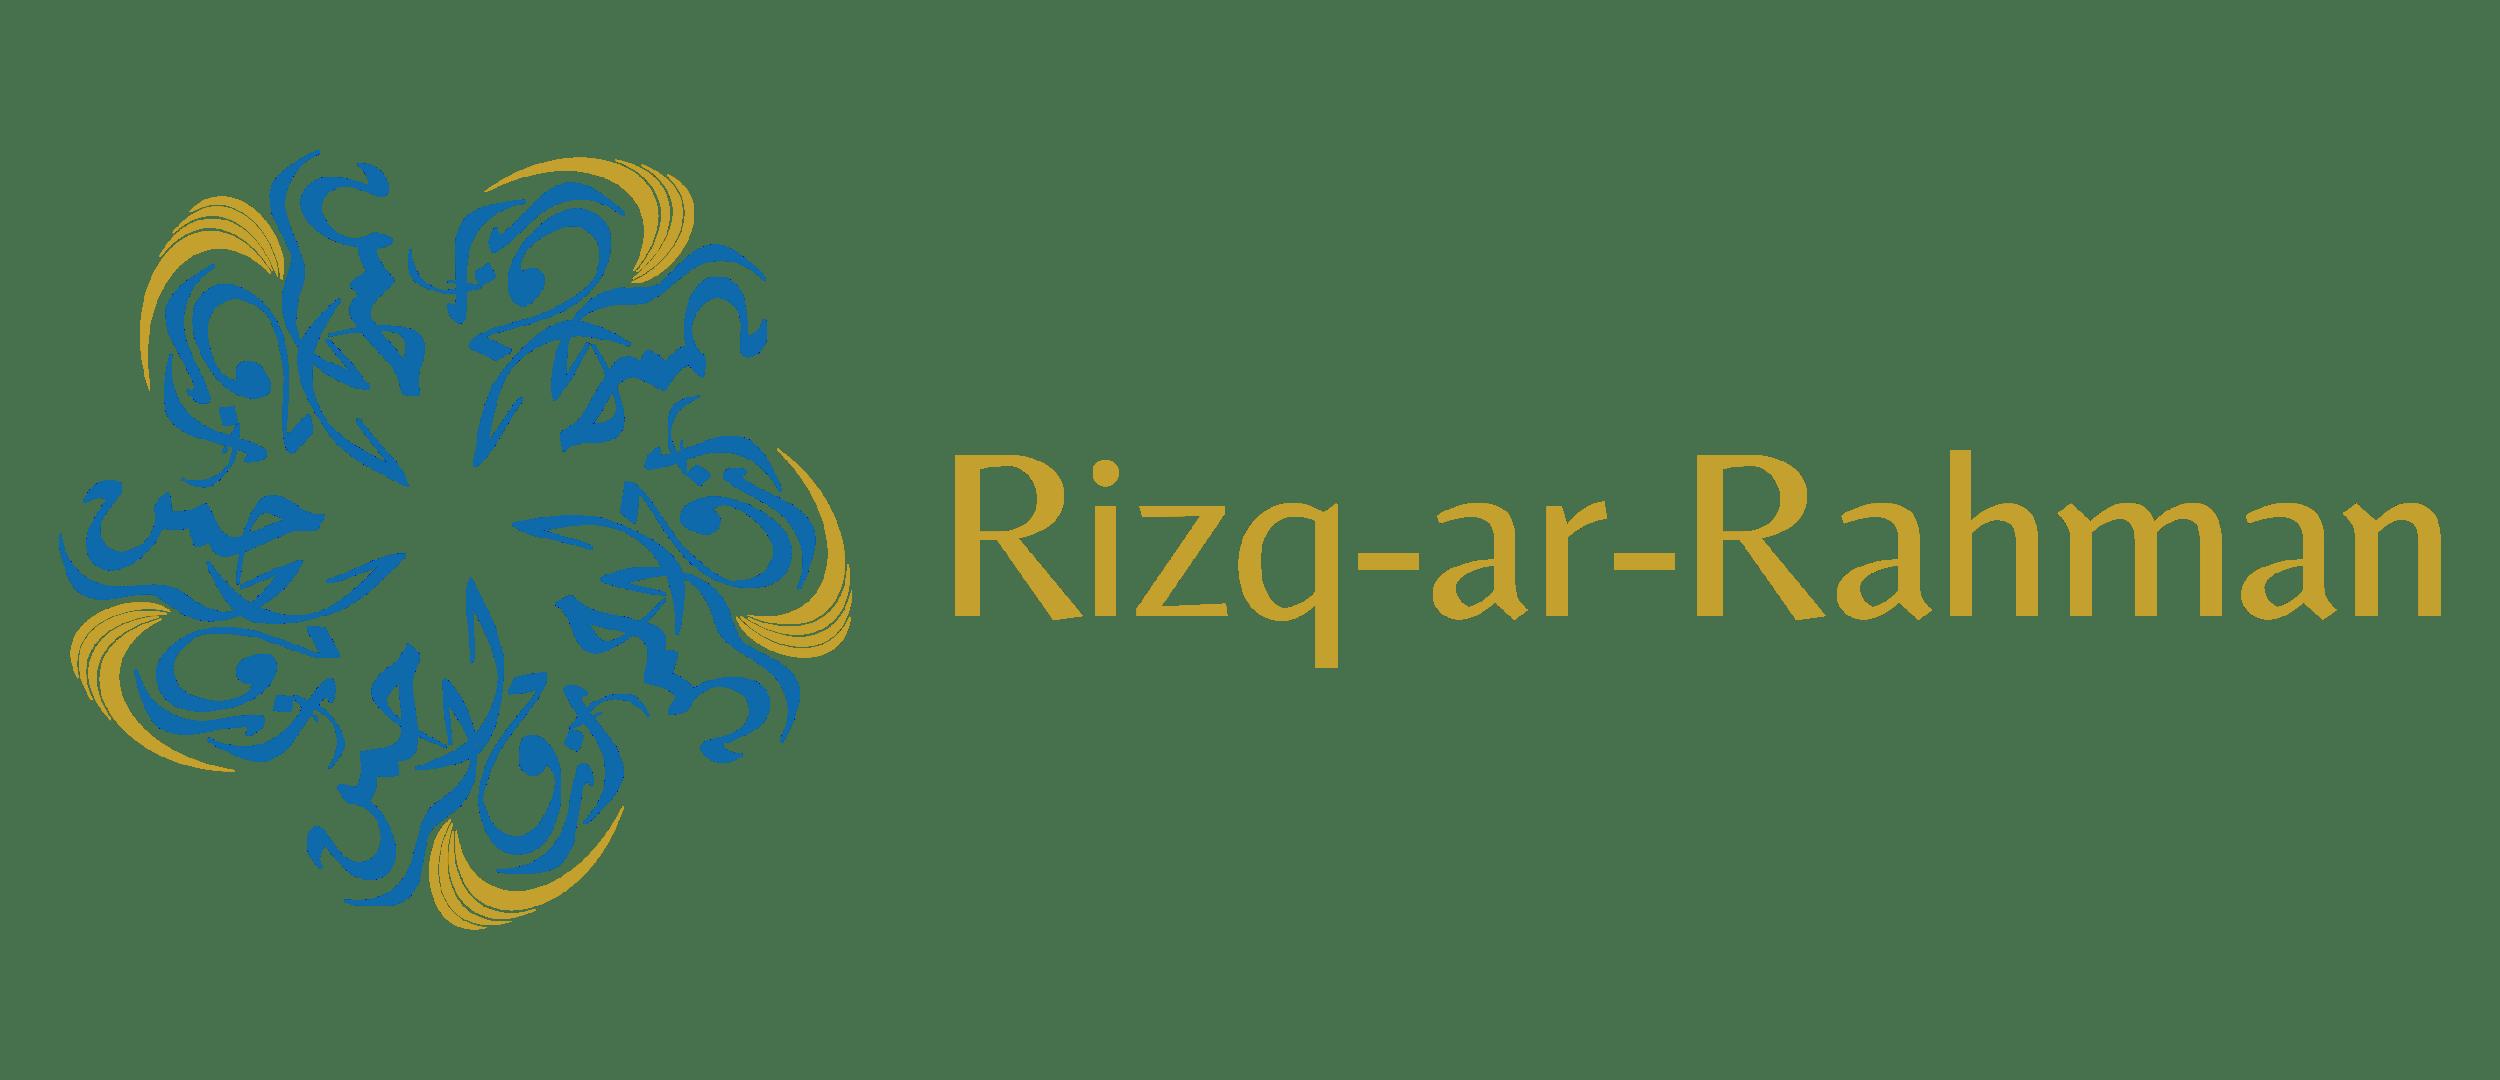 Rizq Ar Rahman | Serving Humanity